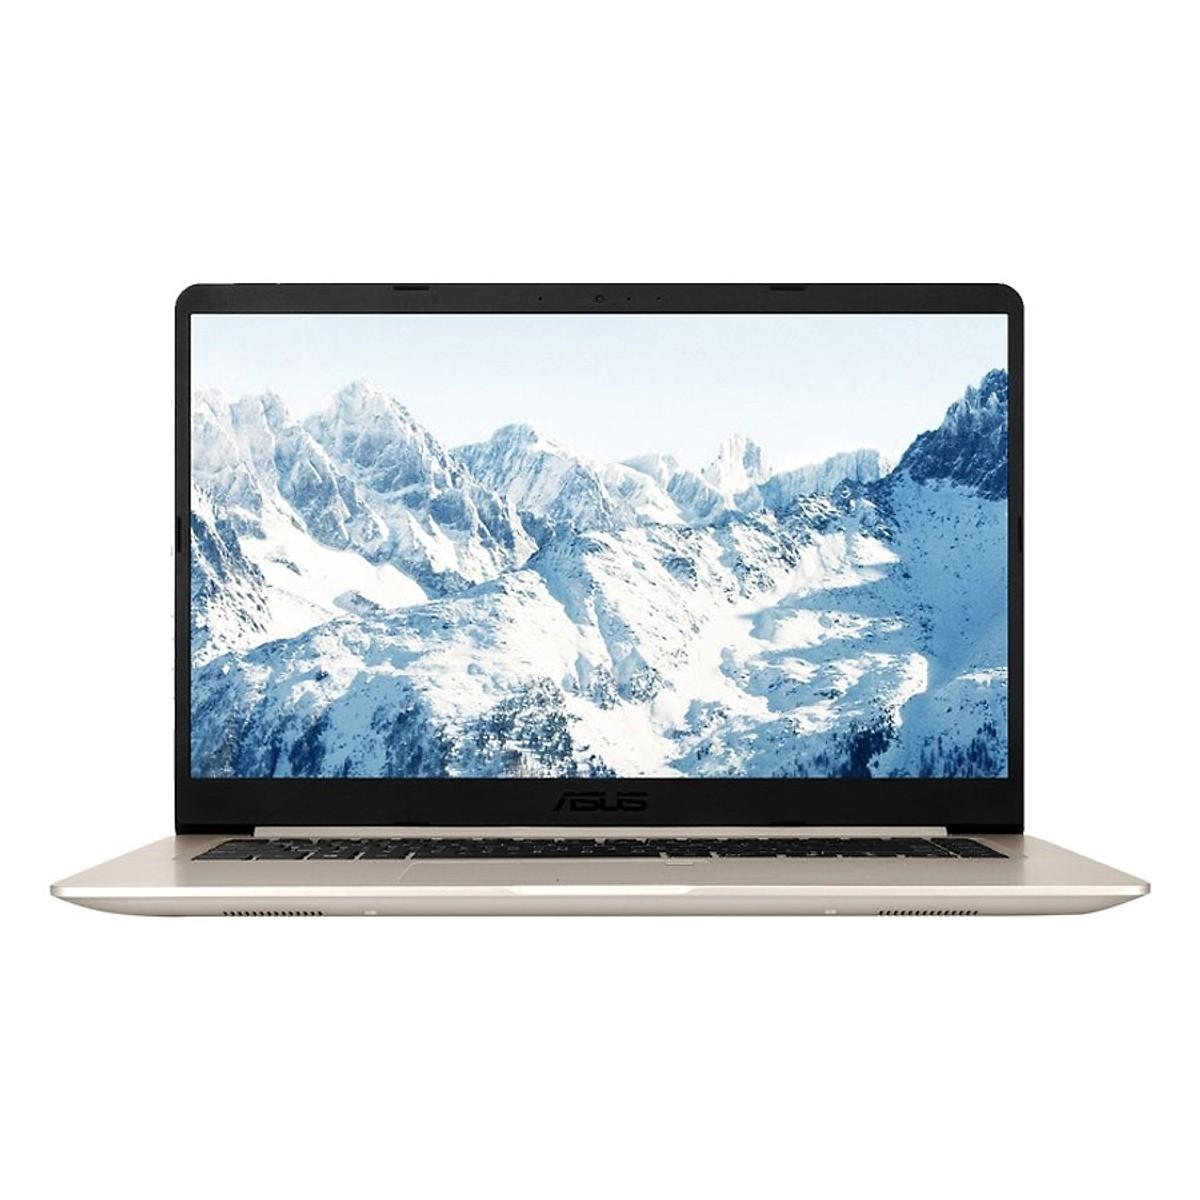 Laptop Asus Vivobook S15 S510UA-BQ111T Core i3-7100U / Win 10